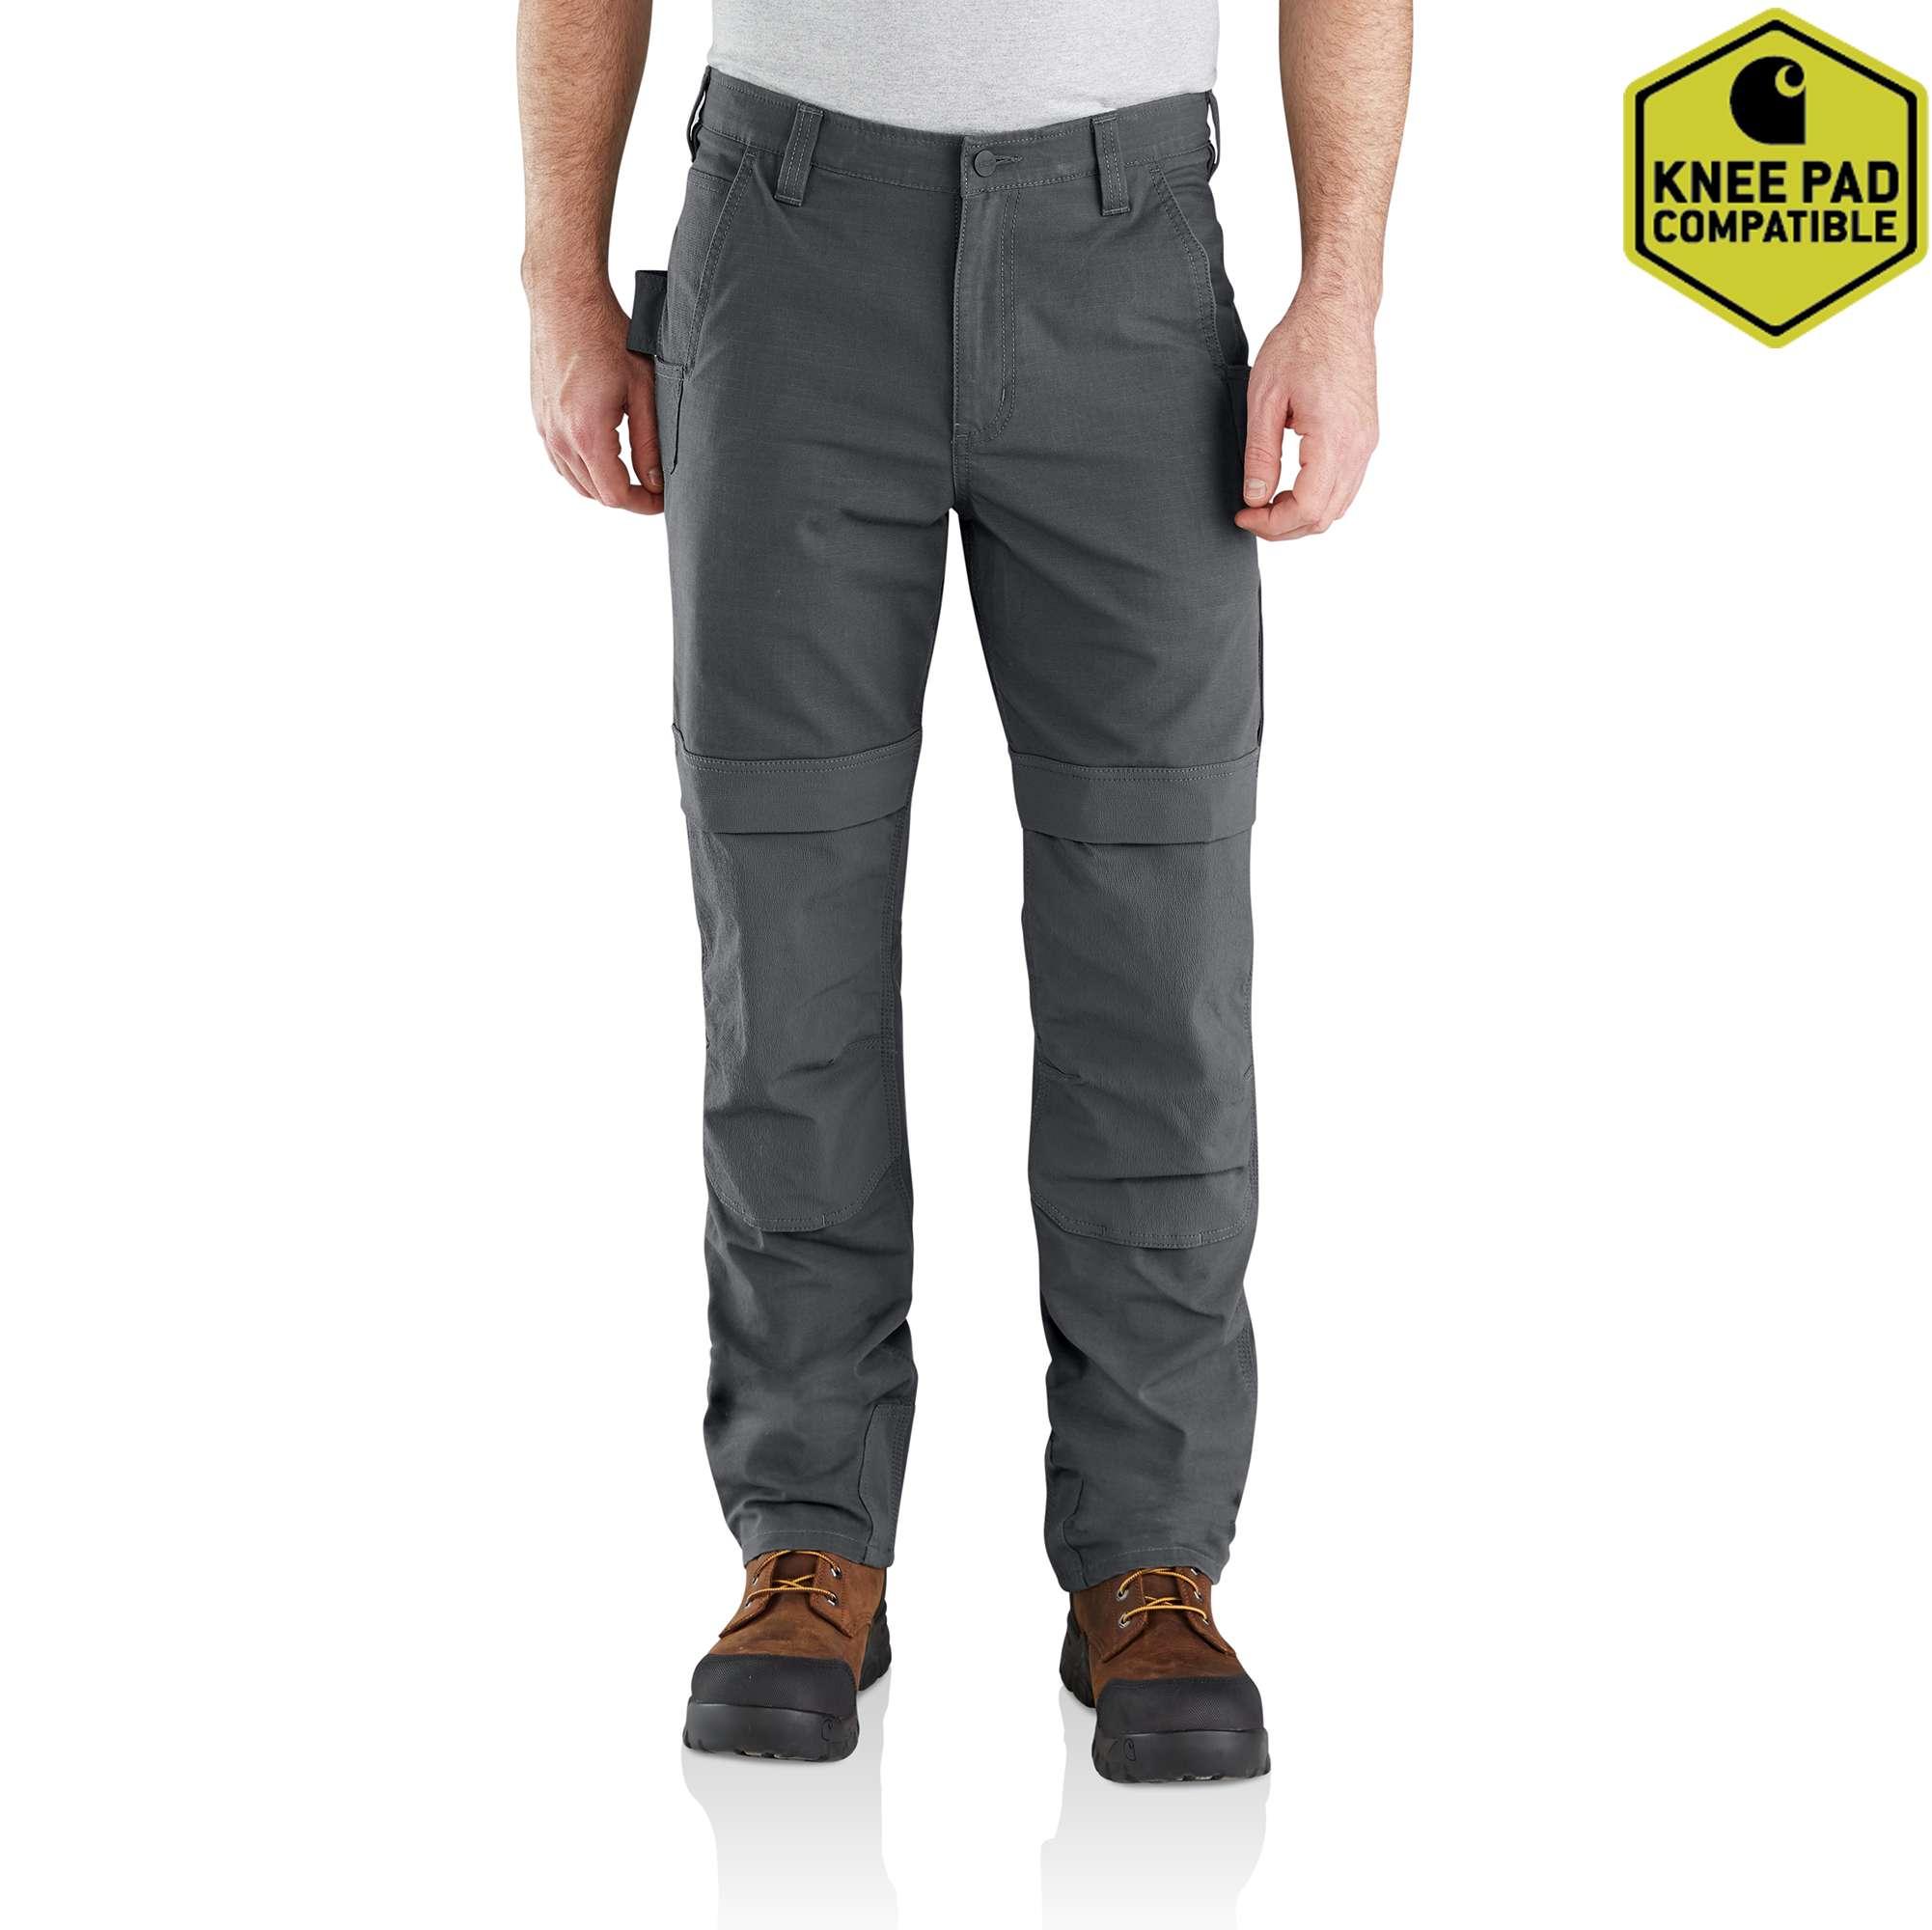 Carhartt Rugged Flex Steel Multi Pocket Pant